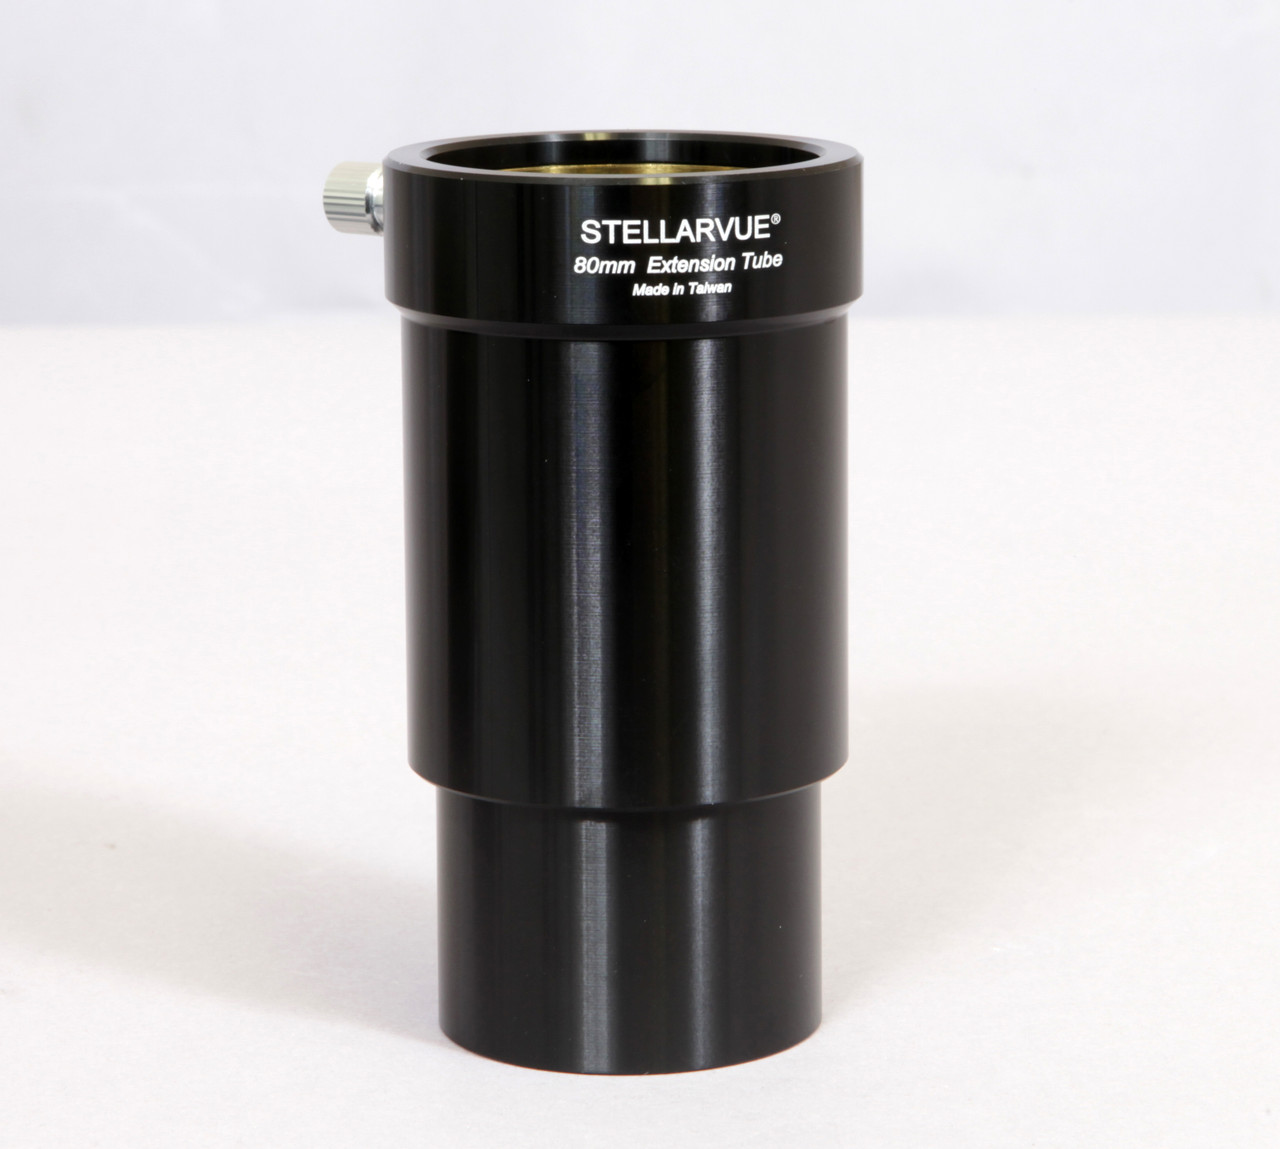 "ET080 2"" Extension Tube - Extends 80 mm"